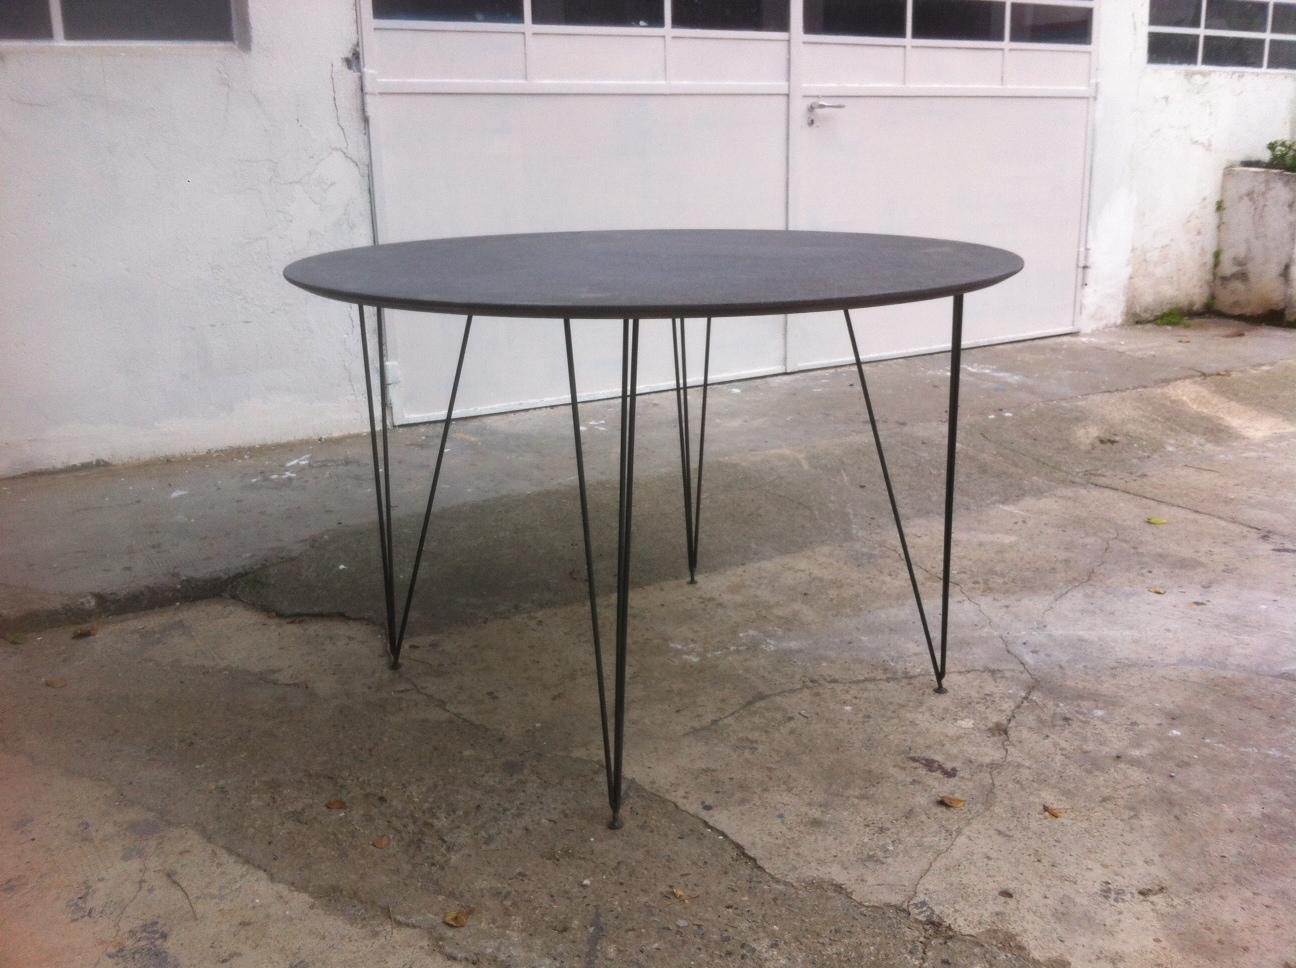 Officine catena tavolo rotondo diametro 120 cm for Tavolo rotondo 160 cm